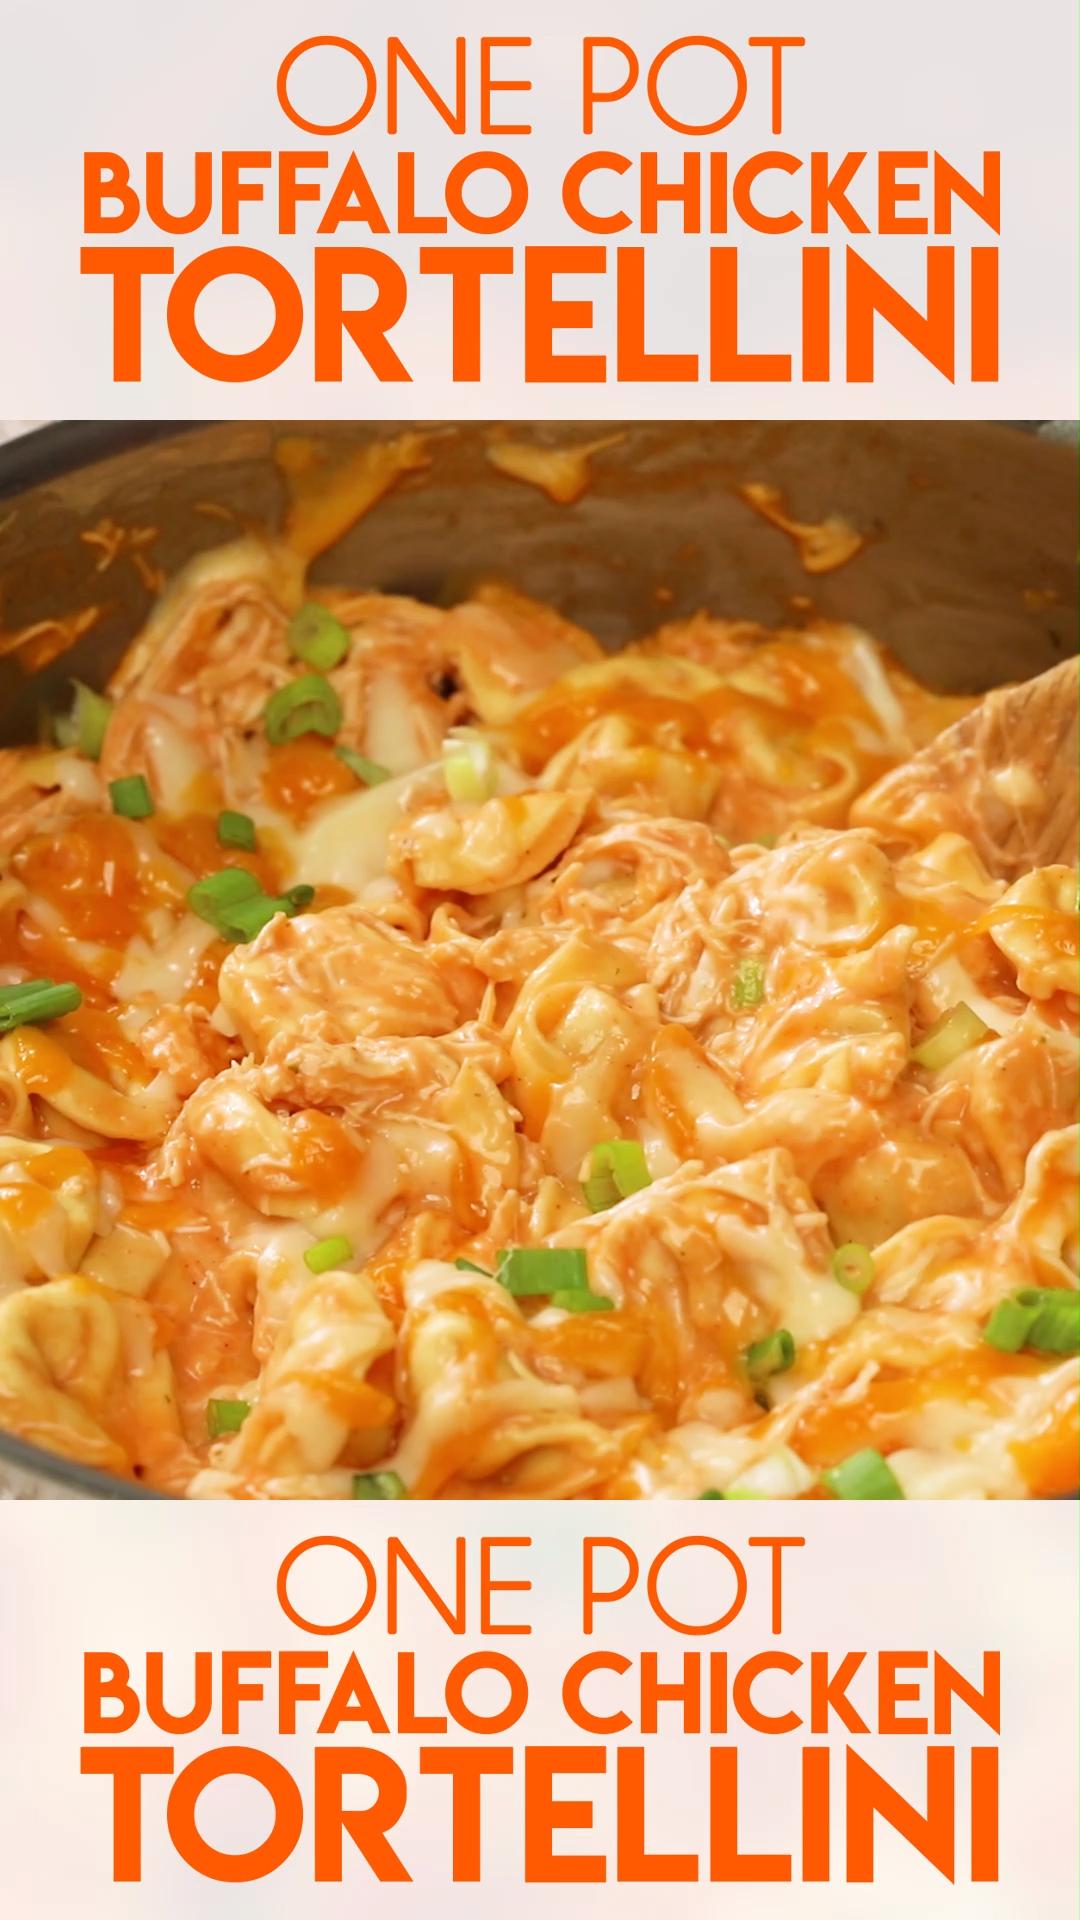 One Pot Buffalo Chicken Tortellini